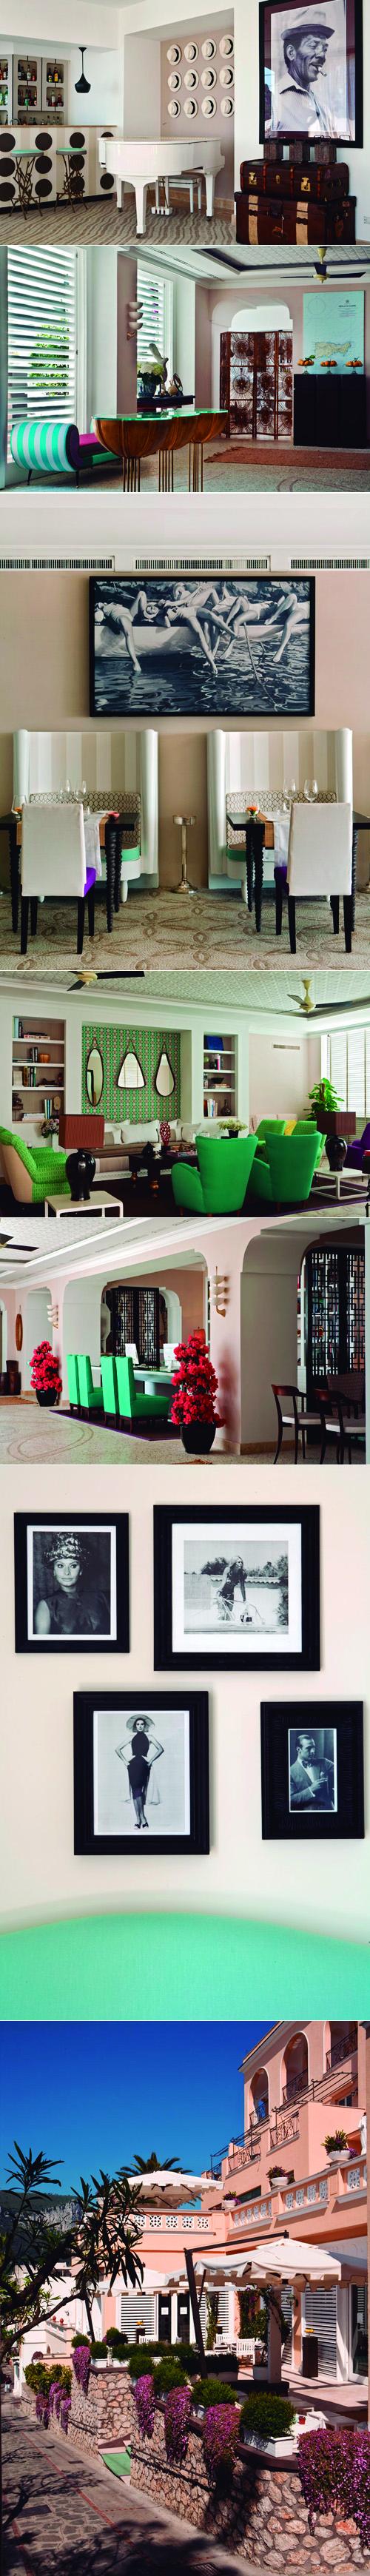 http://www.srtajara.com/wp-content/uploads/2012/08/hotel50-2.jpg